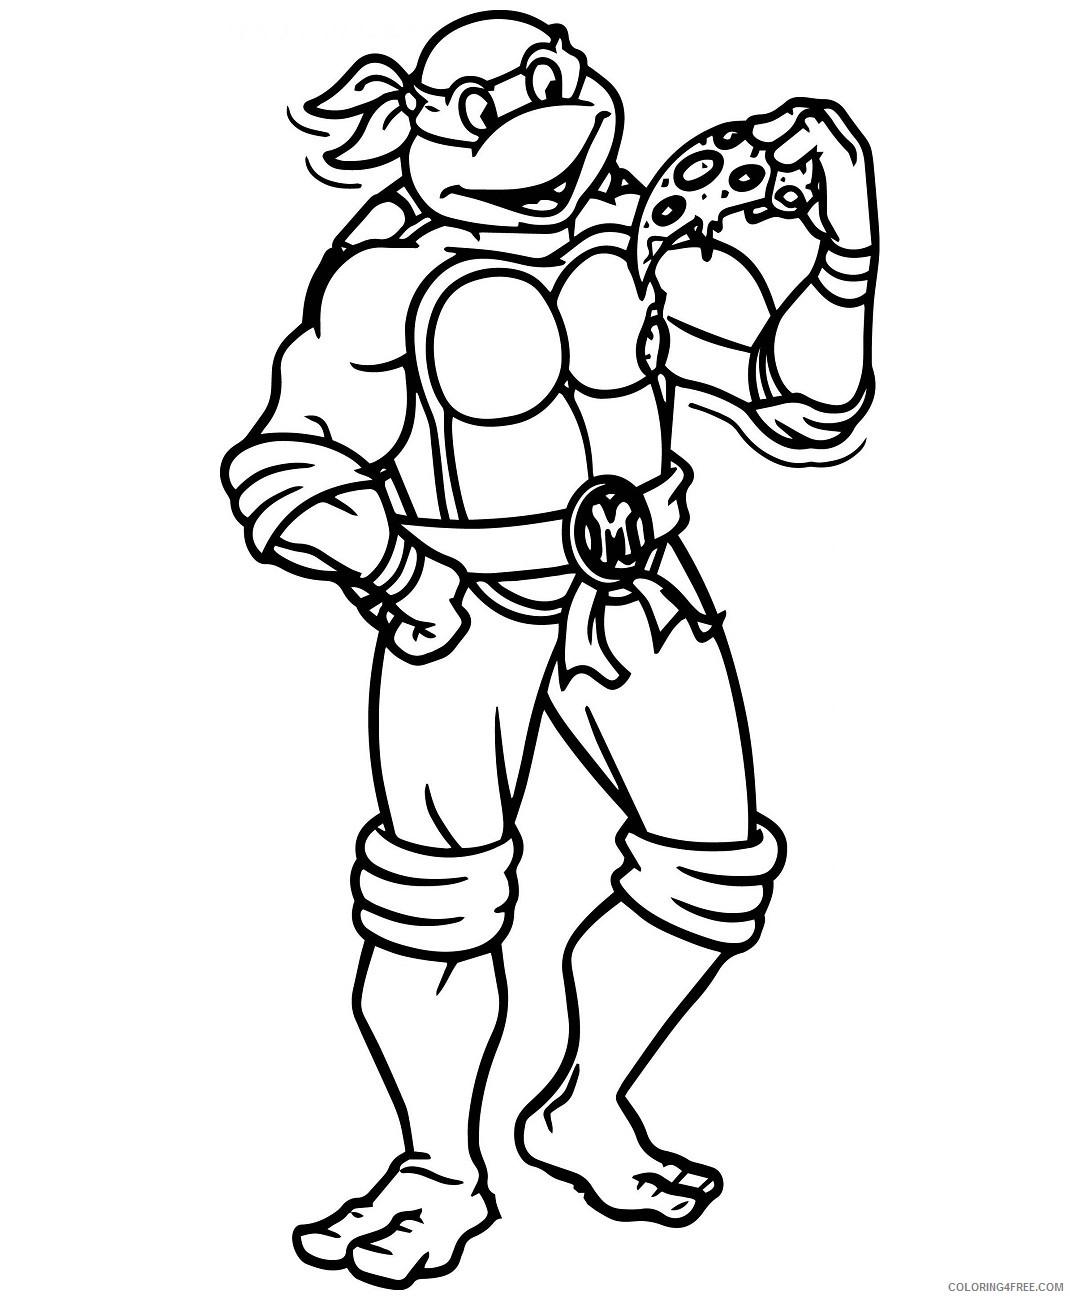 Teenage Mutant Ninja Turtles Coloring Pages Cartoons Amazing Cool Inspiring Design Printable 2020 Coloring4free Coloring4free Com